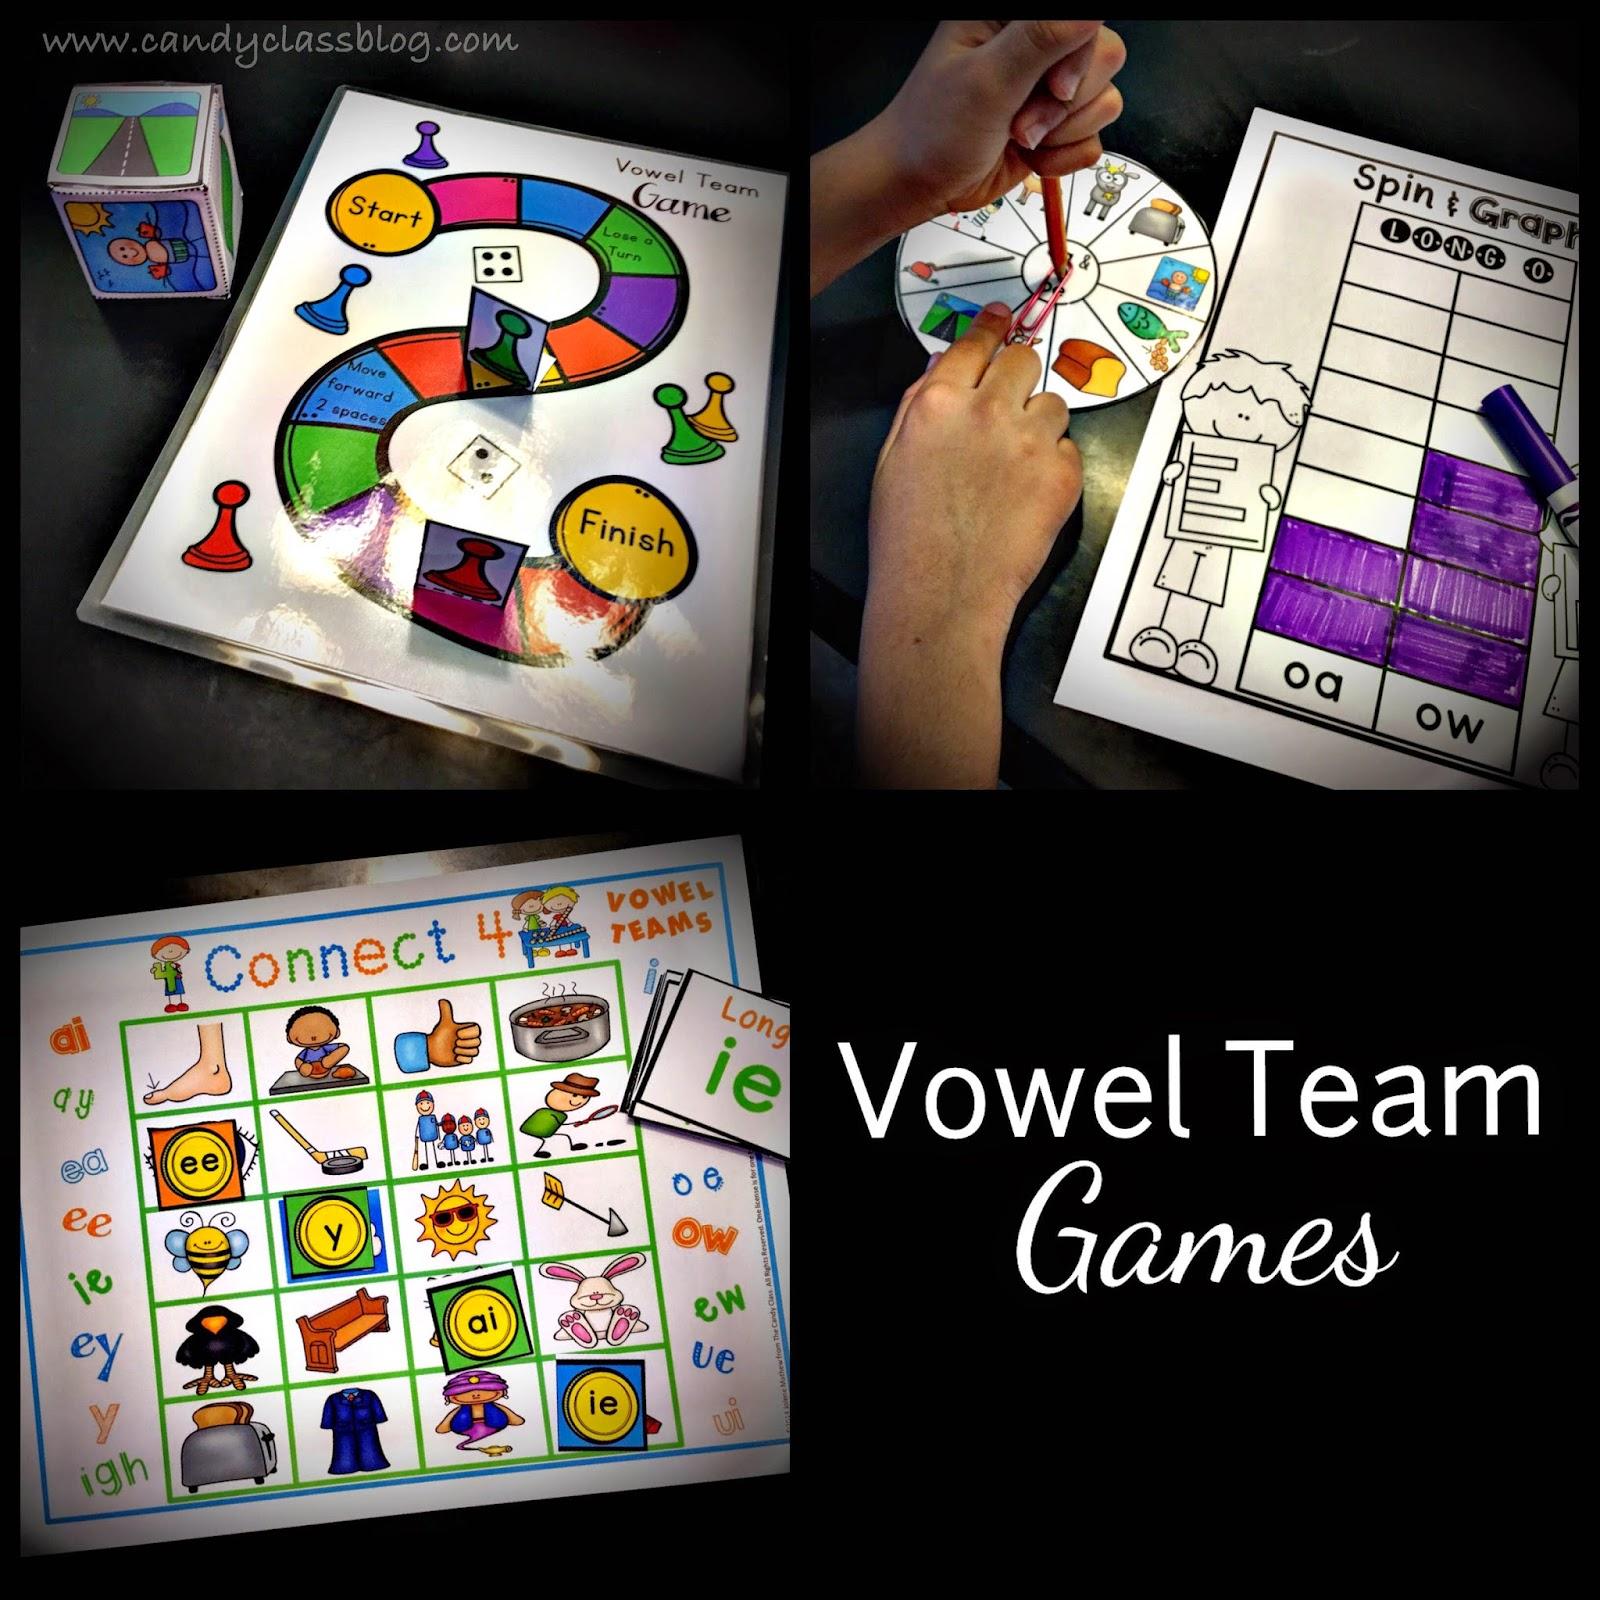 Oa Oe Ow Oa Oe The Vowel Teams